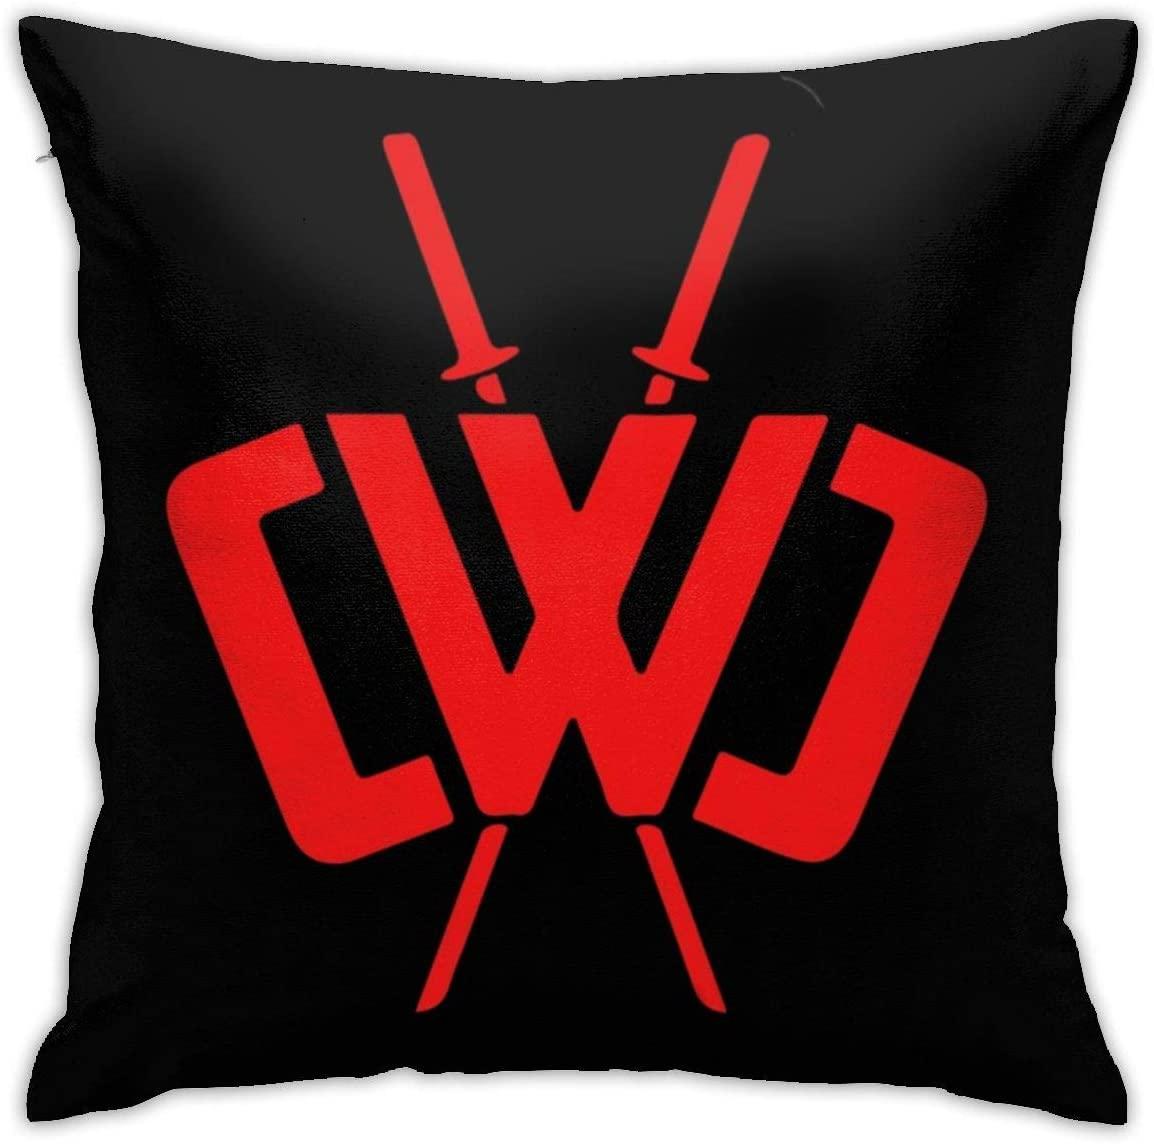 Dxddsdks CWC Chad Wild Clay Ninja Throw Pillow Covers Cotton Polyester Cushion Cover Cases Pillowcases Sofa Home Decor 18â€x 18â€Inch (45 x 45cm)